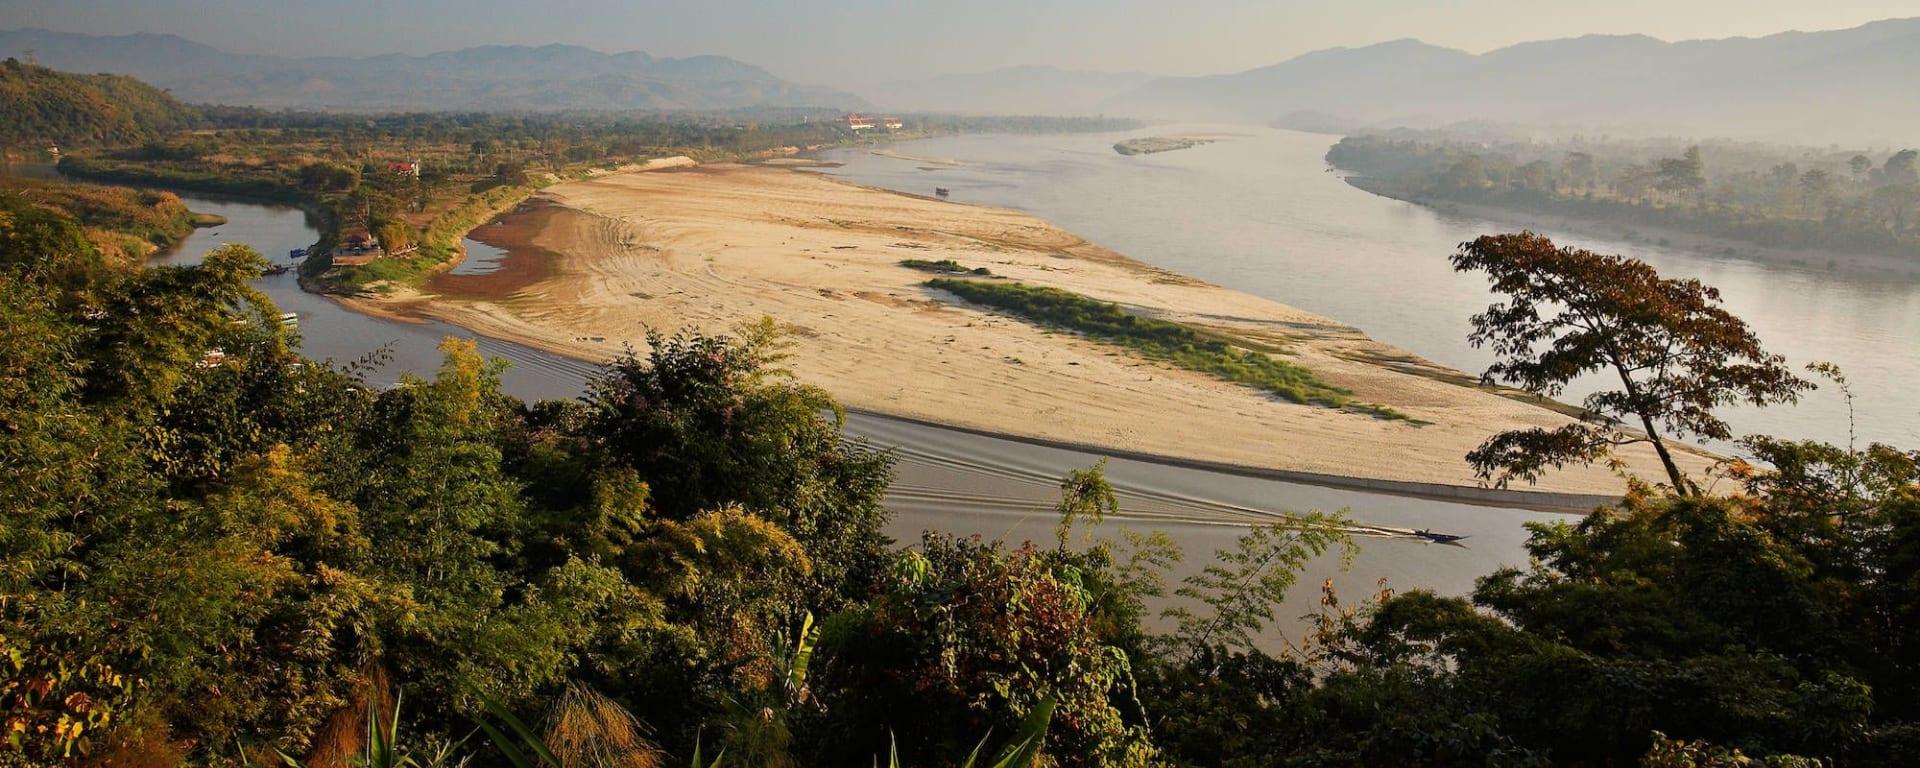 Thaïlande compacte de Bangkok: Mekong River Golden Triangle